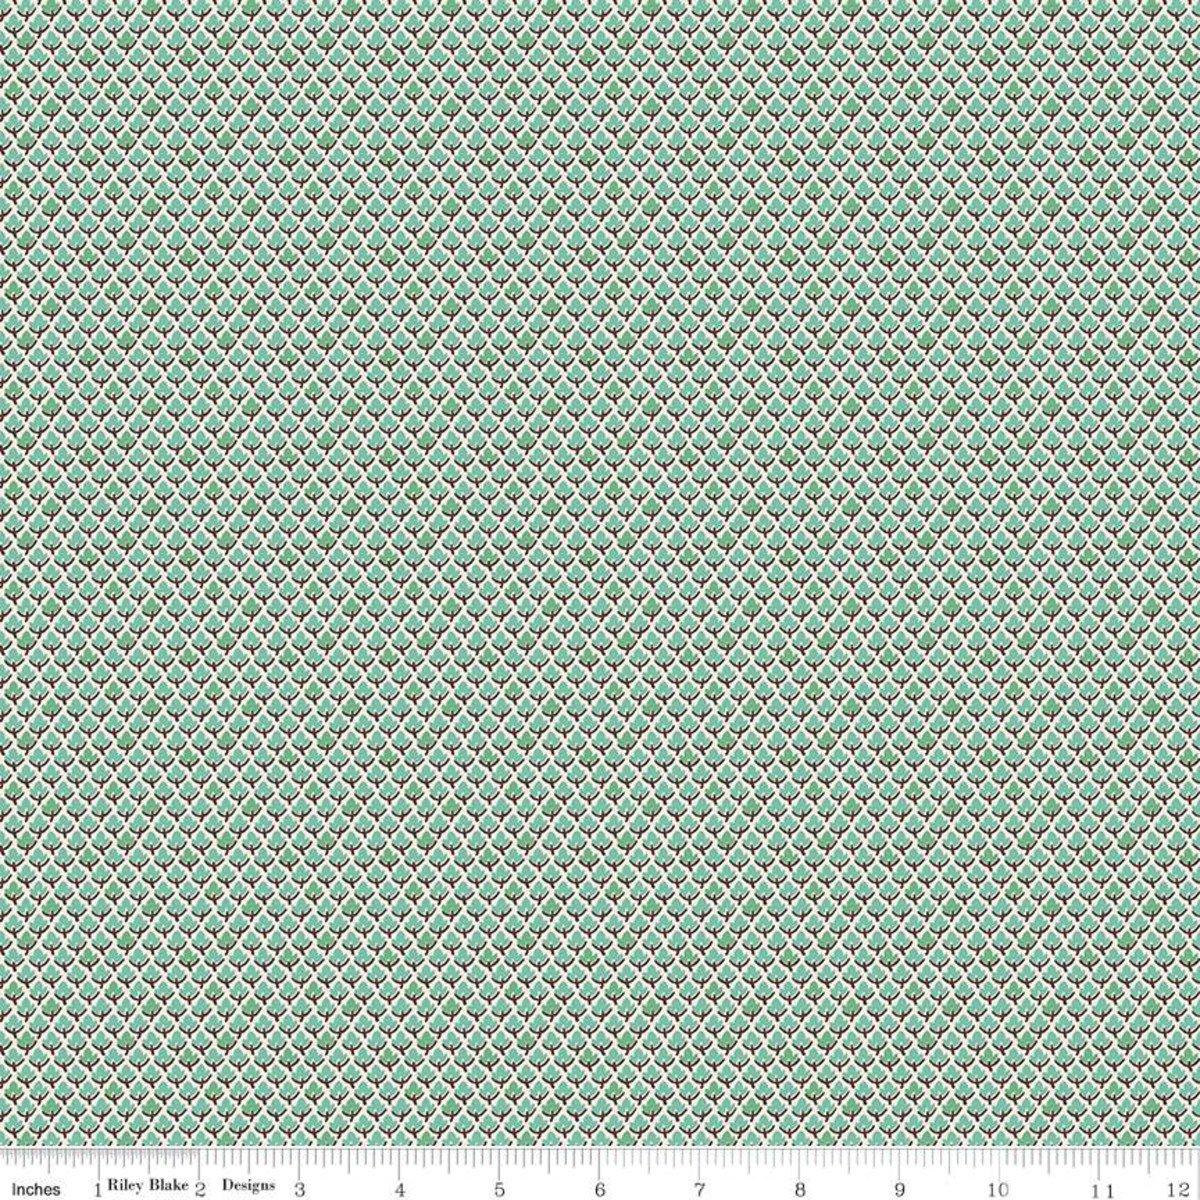 Prim C9700 Leaves Sea Glass by Lori Holt for Riley Blake Designs